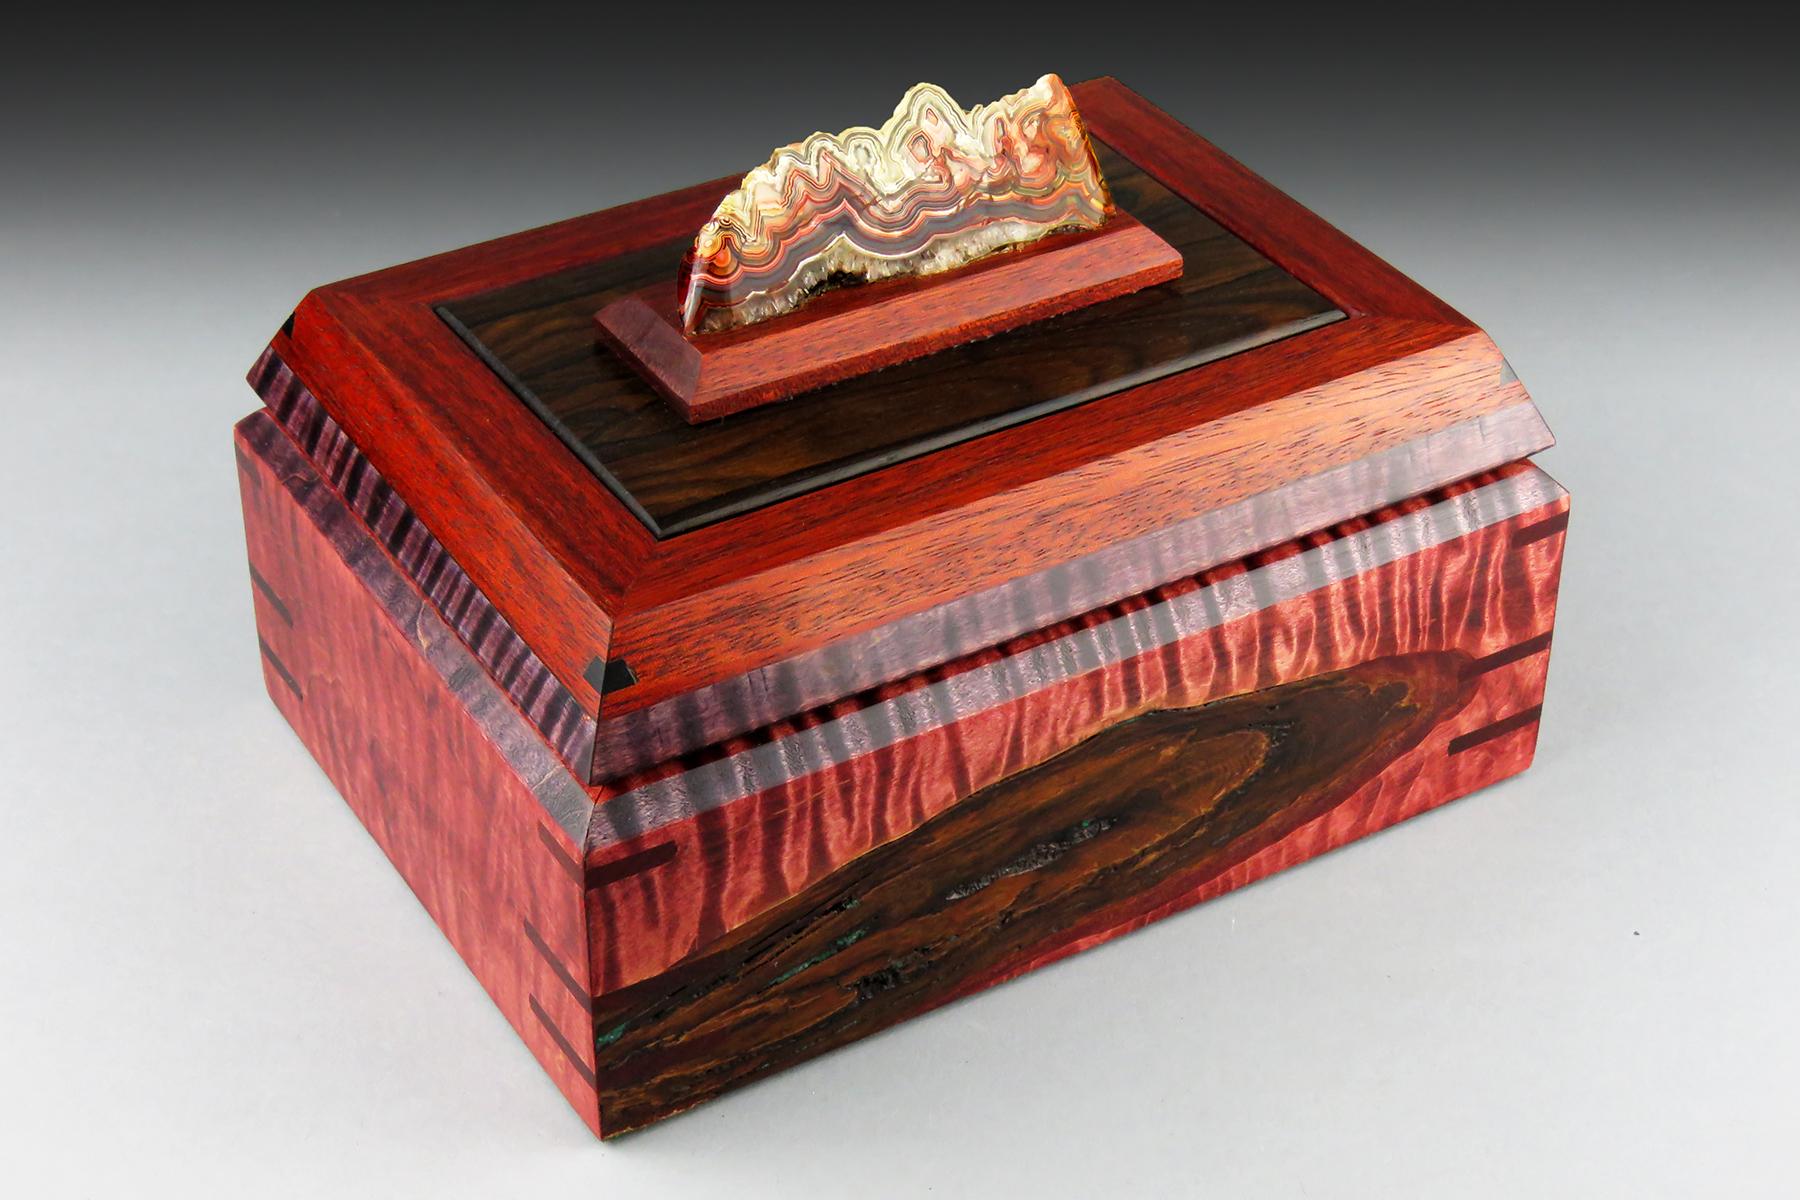 Rainbow Agate Jewelry Box: $330